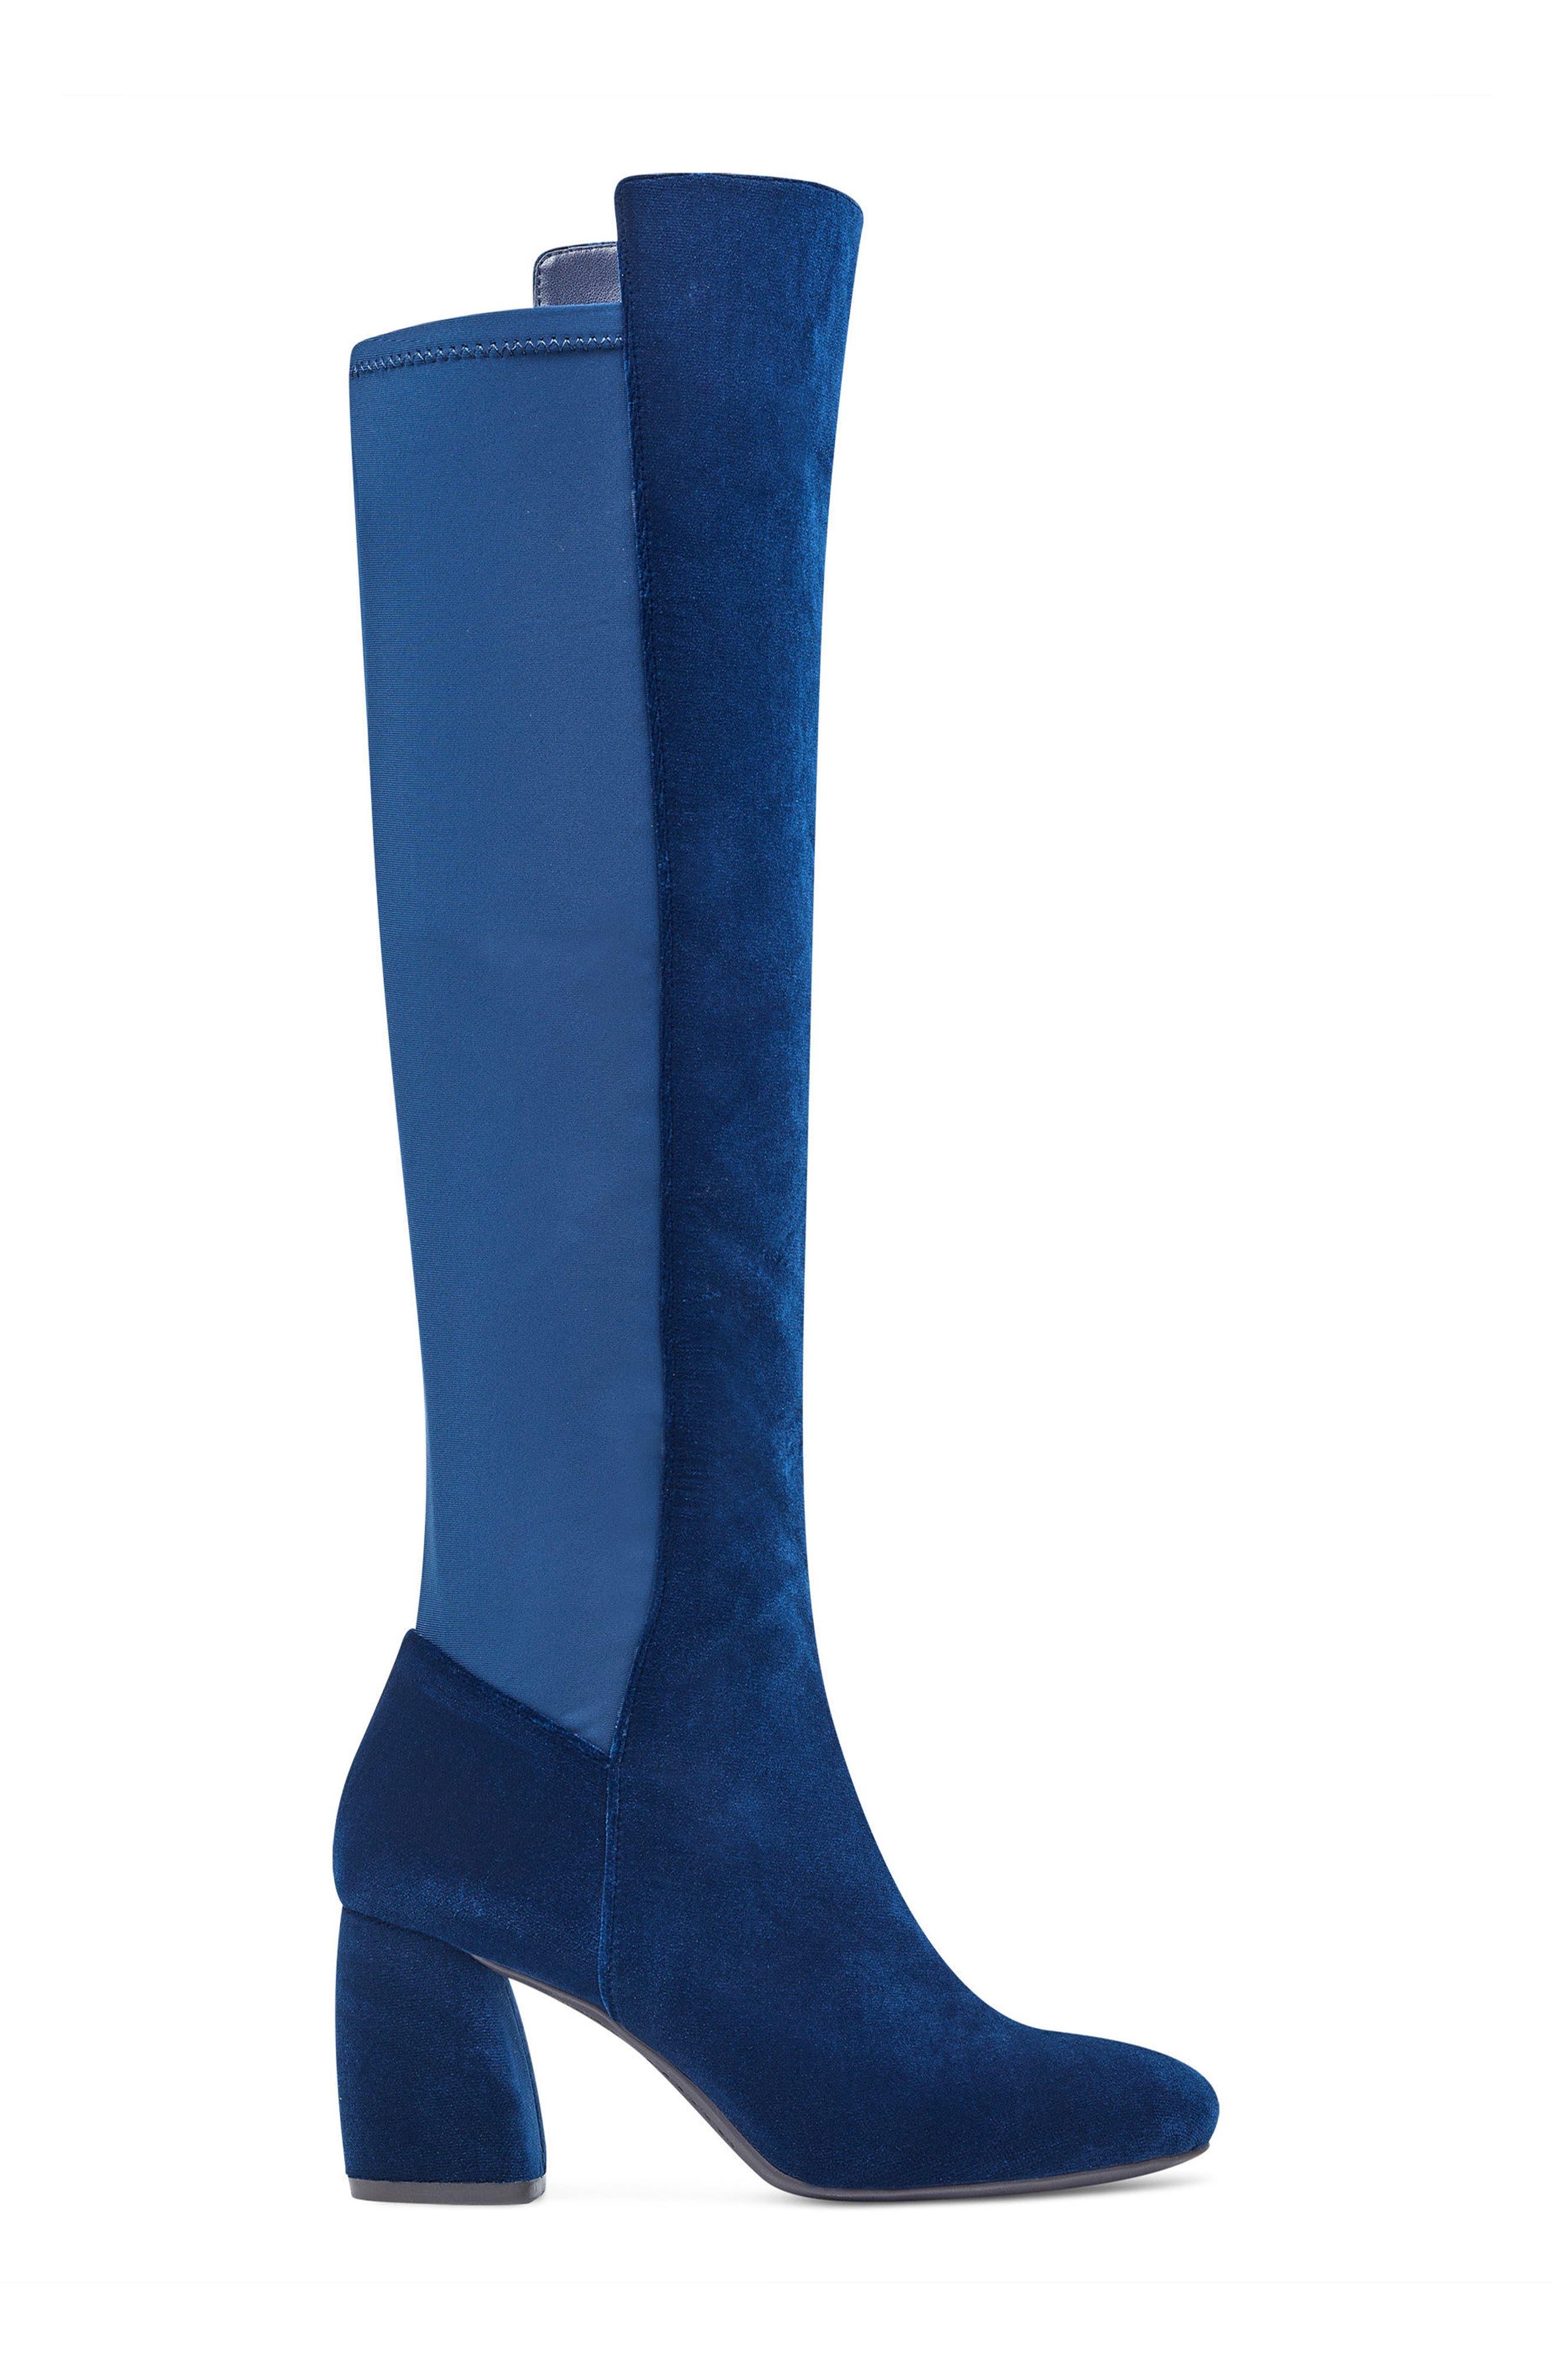 Kerianna Knee High Boot,                             Alternate thumbnail 3, color,                             Navy Fabric